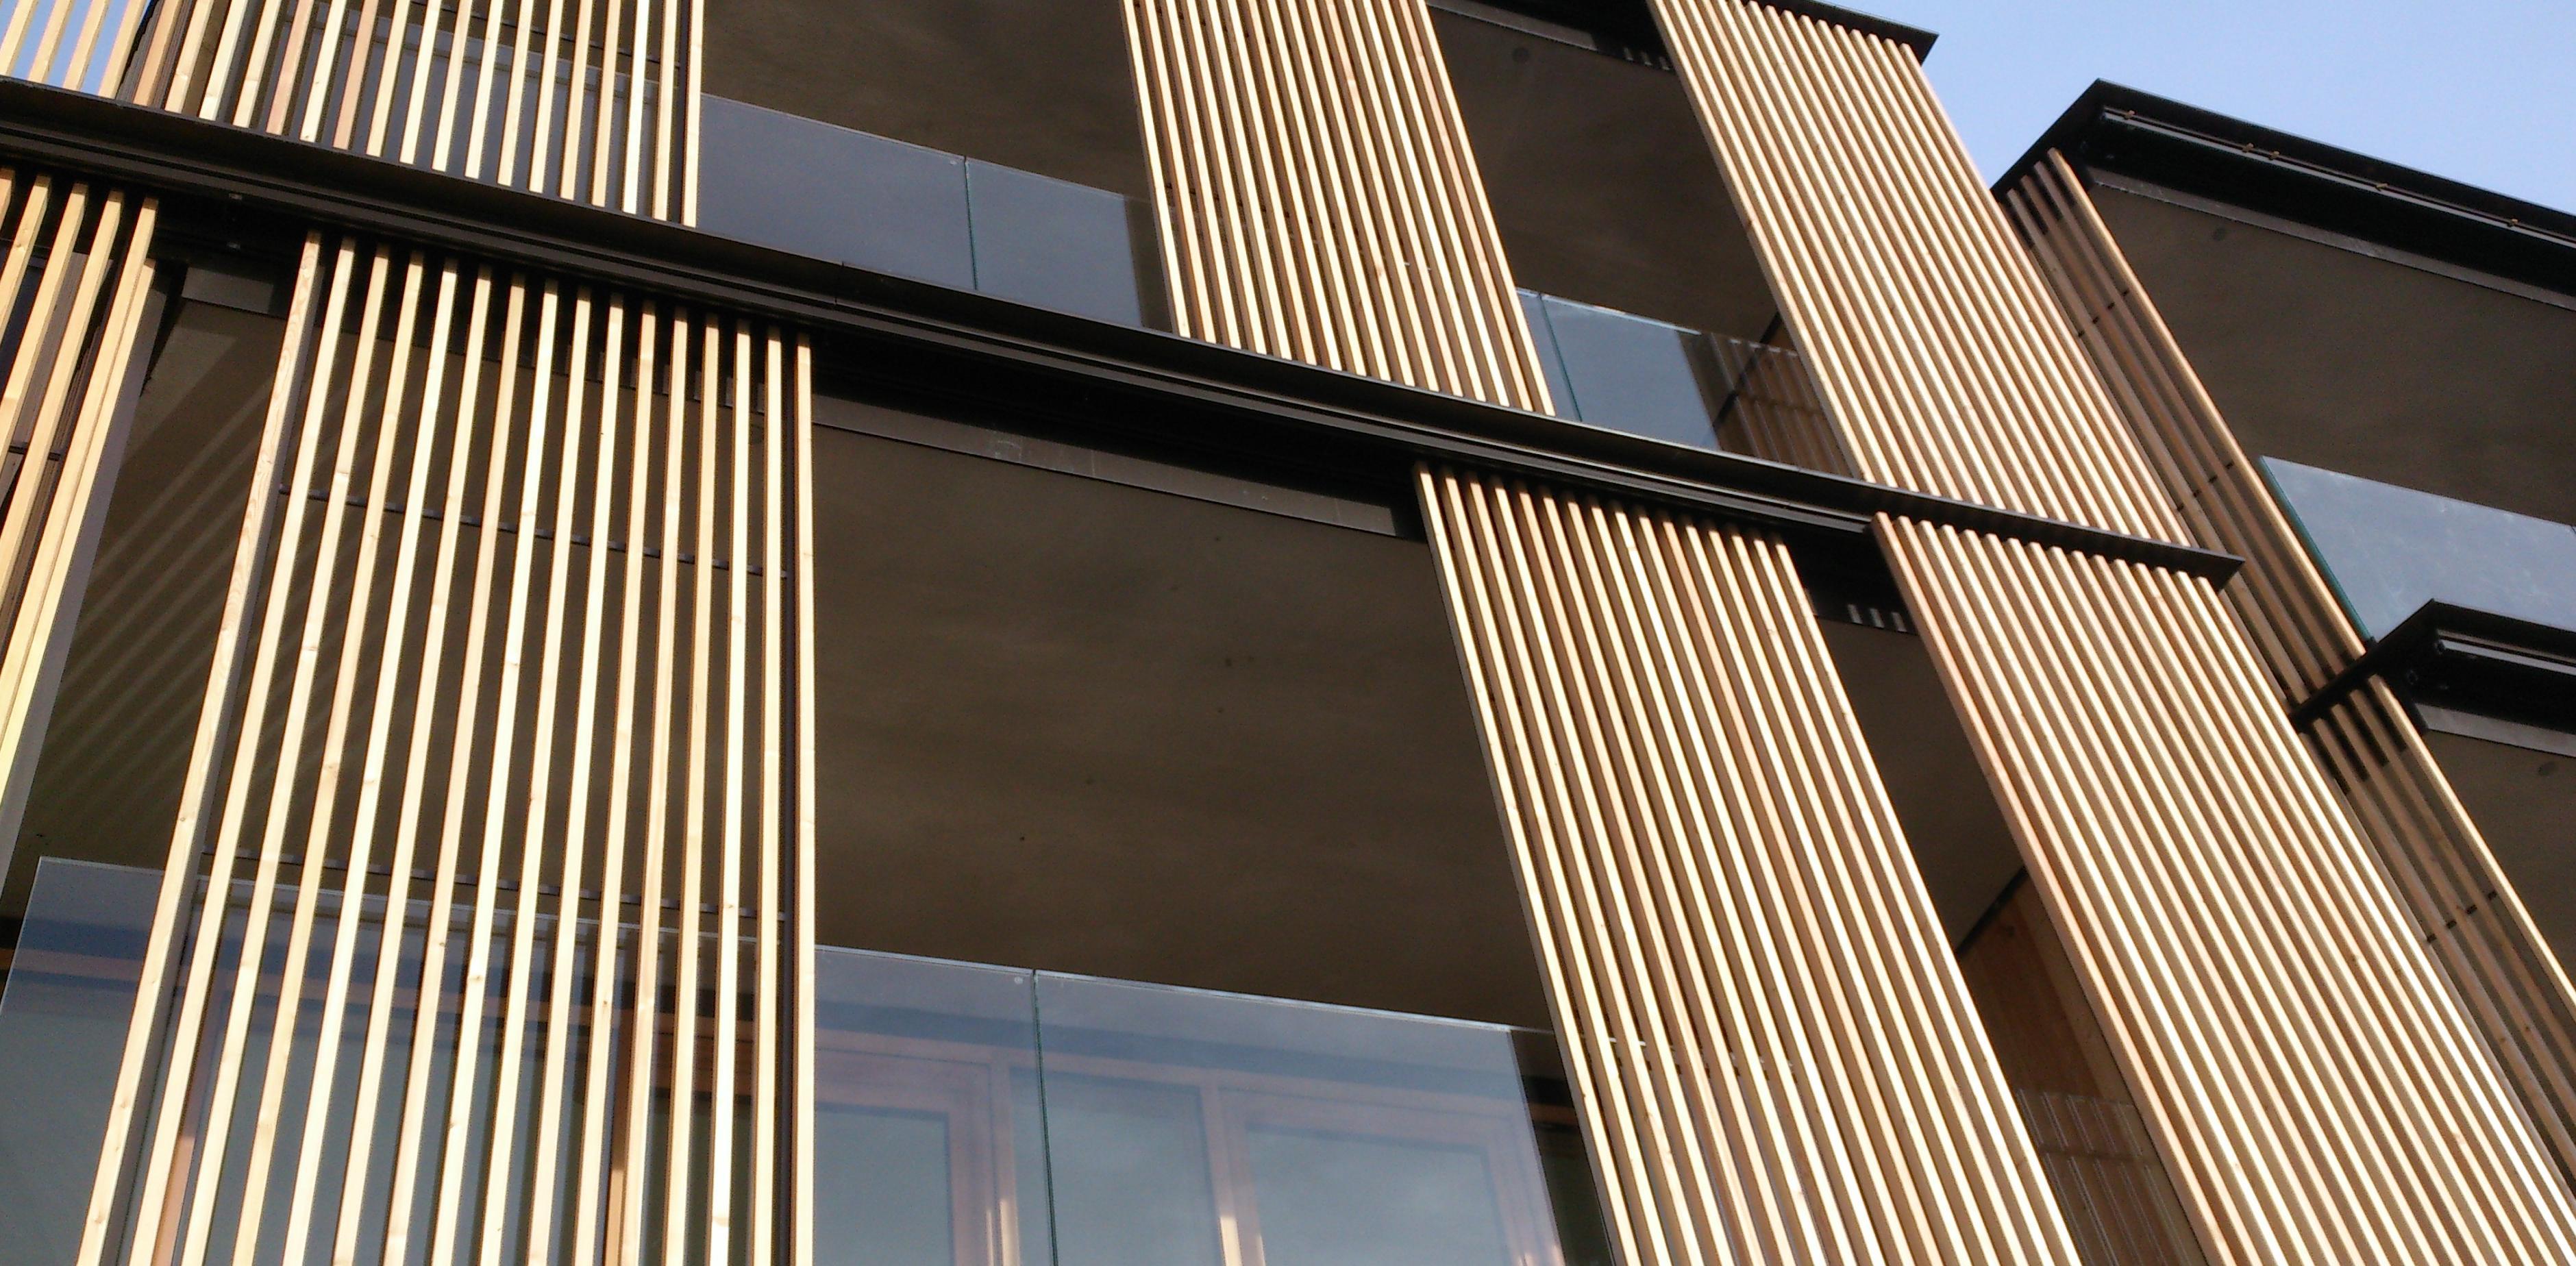 Schiebeladen Sonnenschutz Fur Fenster Turen Dkl